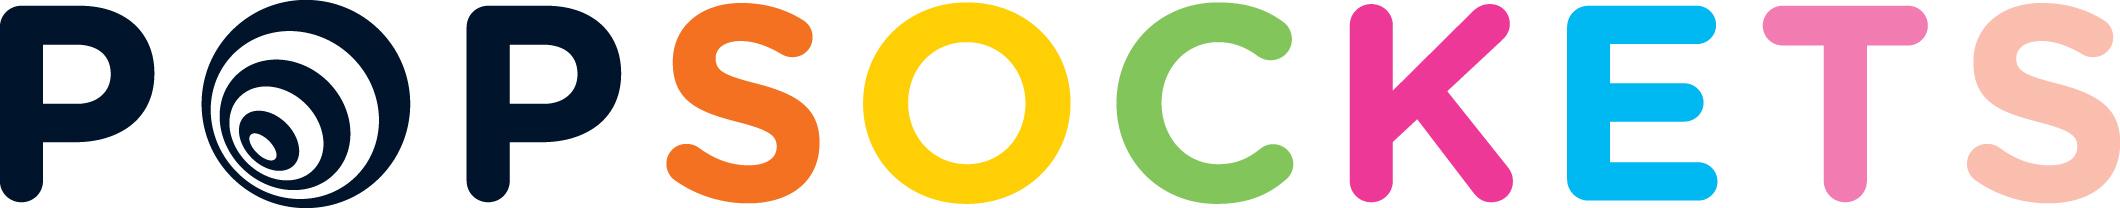 Popsocket Logo